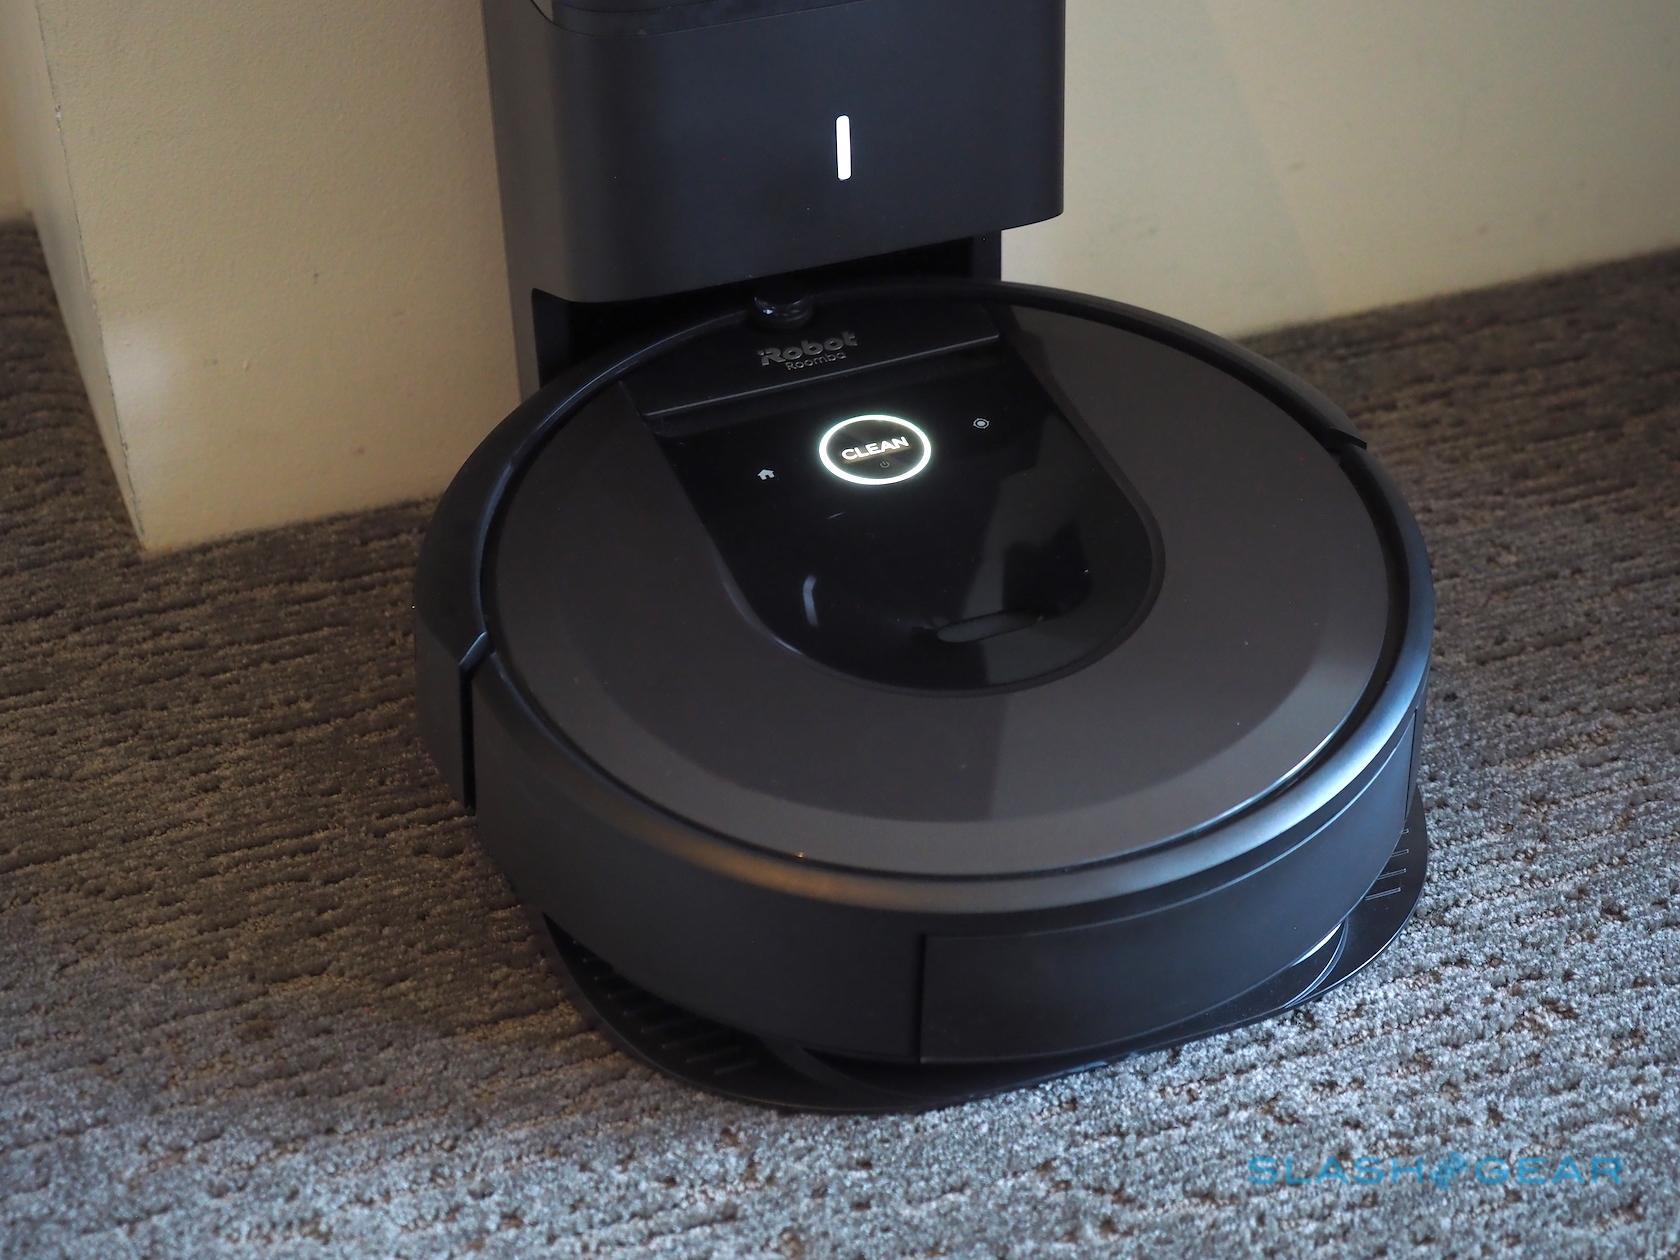 iRobot's self-emptying Roomba i7+ fixes robot vacuums' big